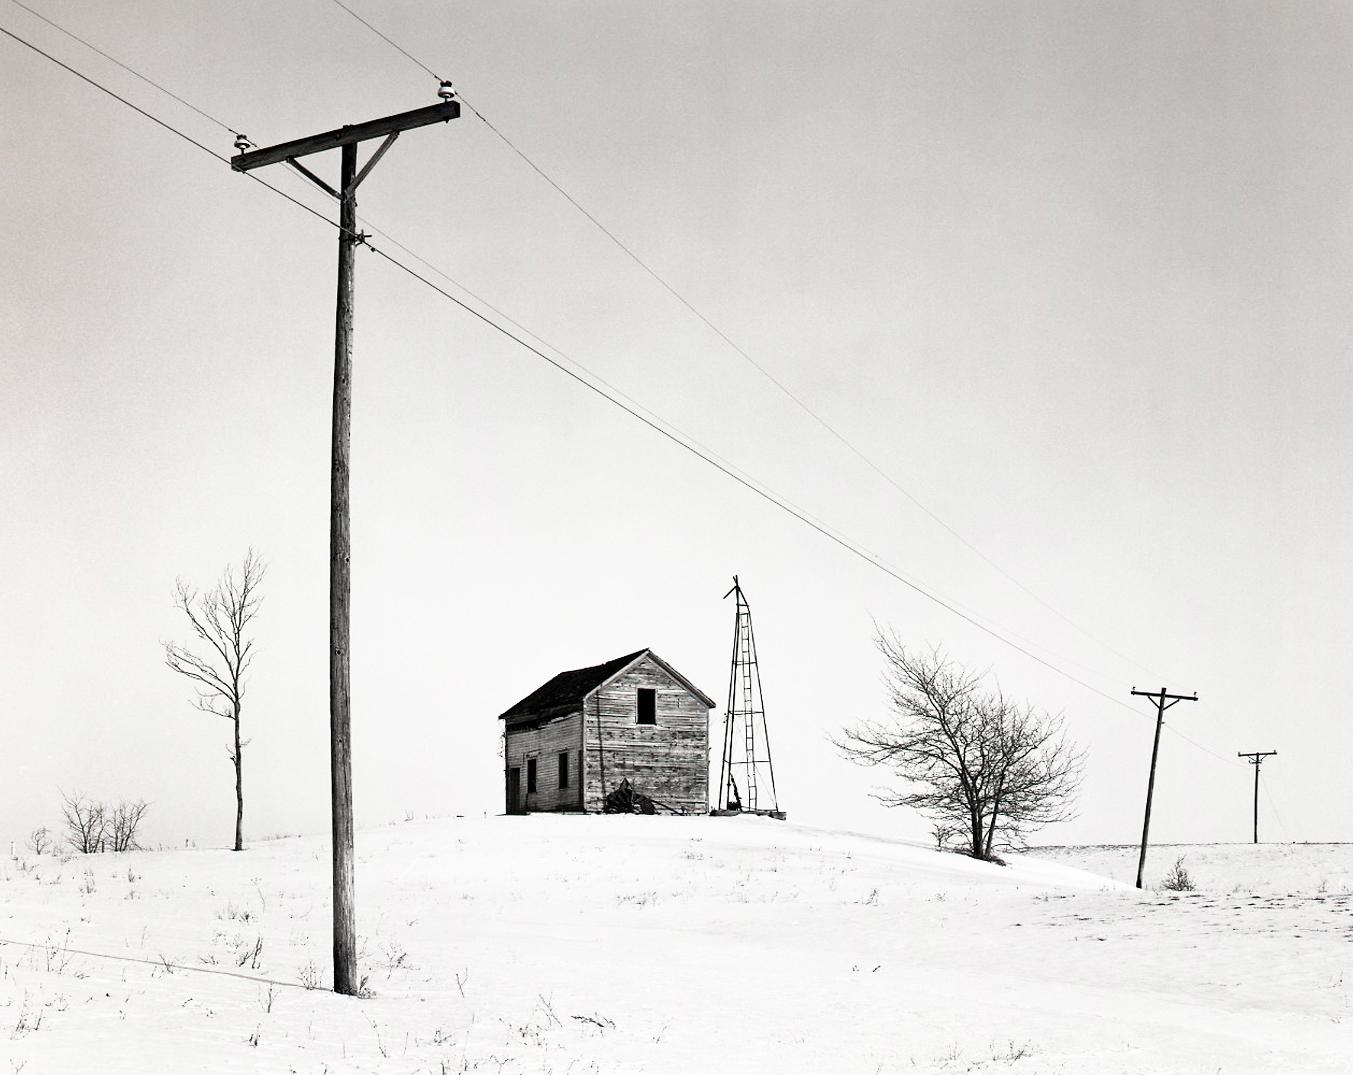 12_08_Ridott_IL_Winter+Landscape_Telephone+Pole+&+Barn_Neg_1_edit.jpg